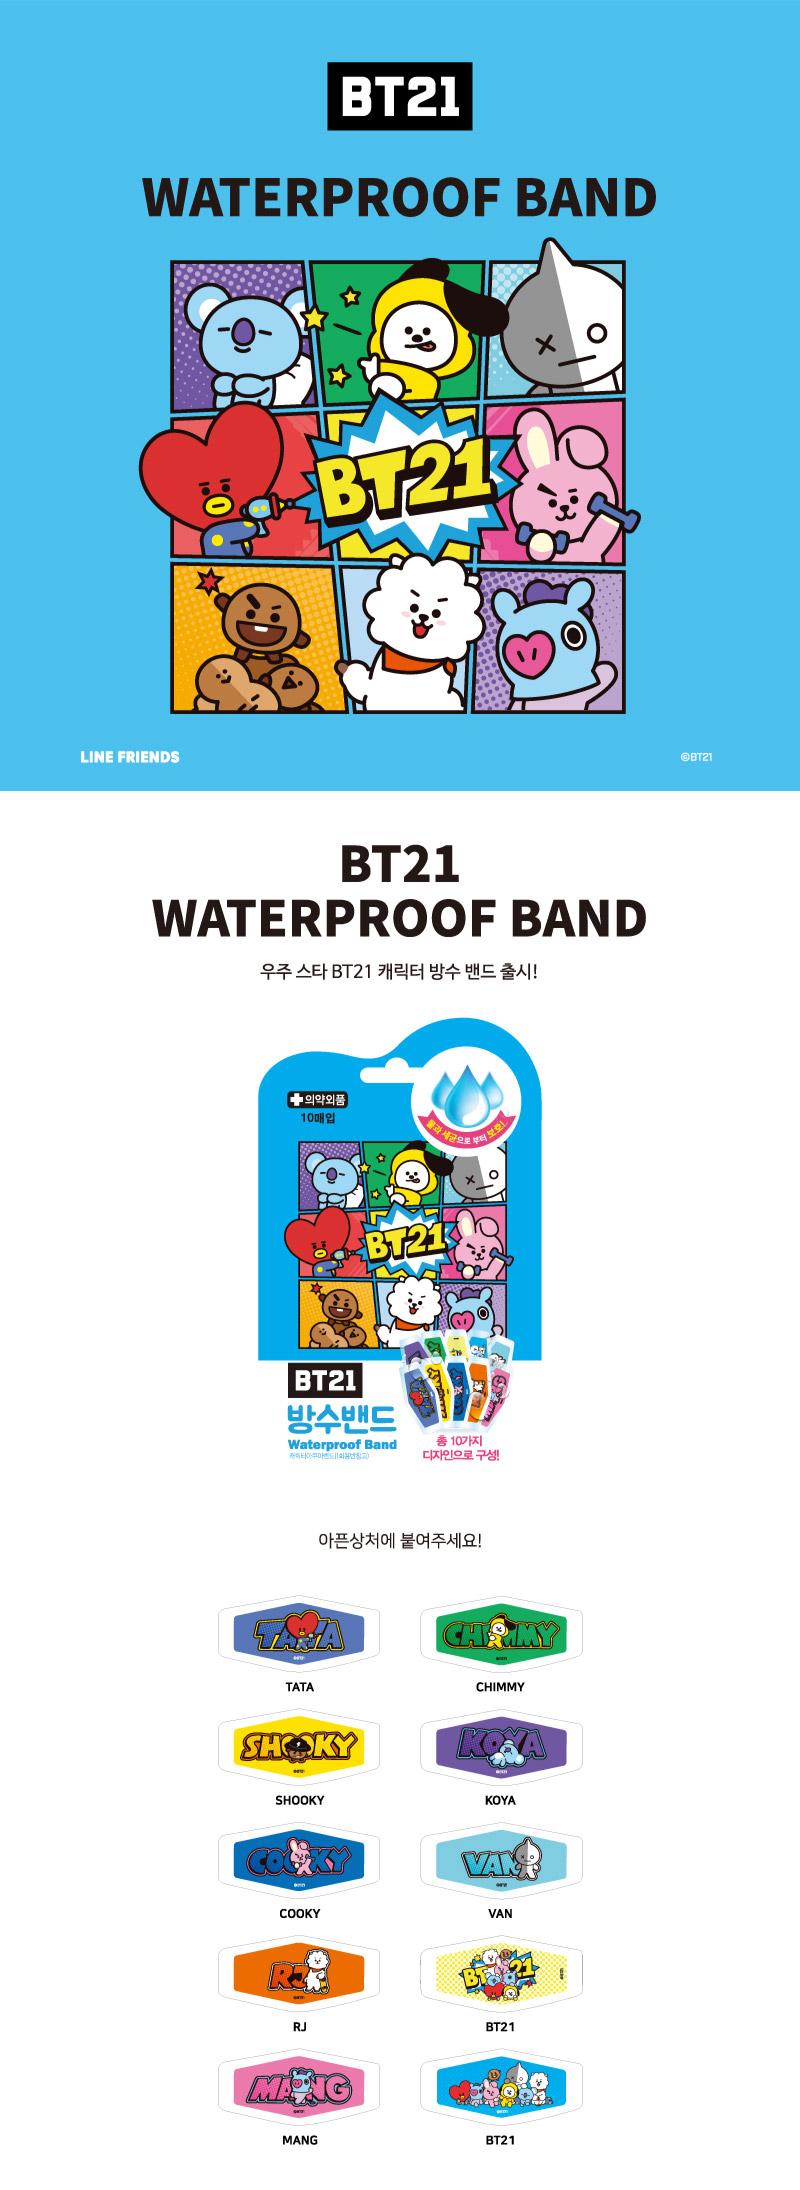 bt21_taeyanglh_waterproofband_01.jpg